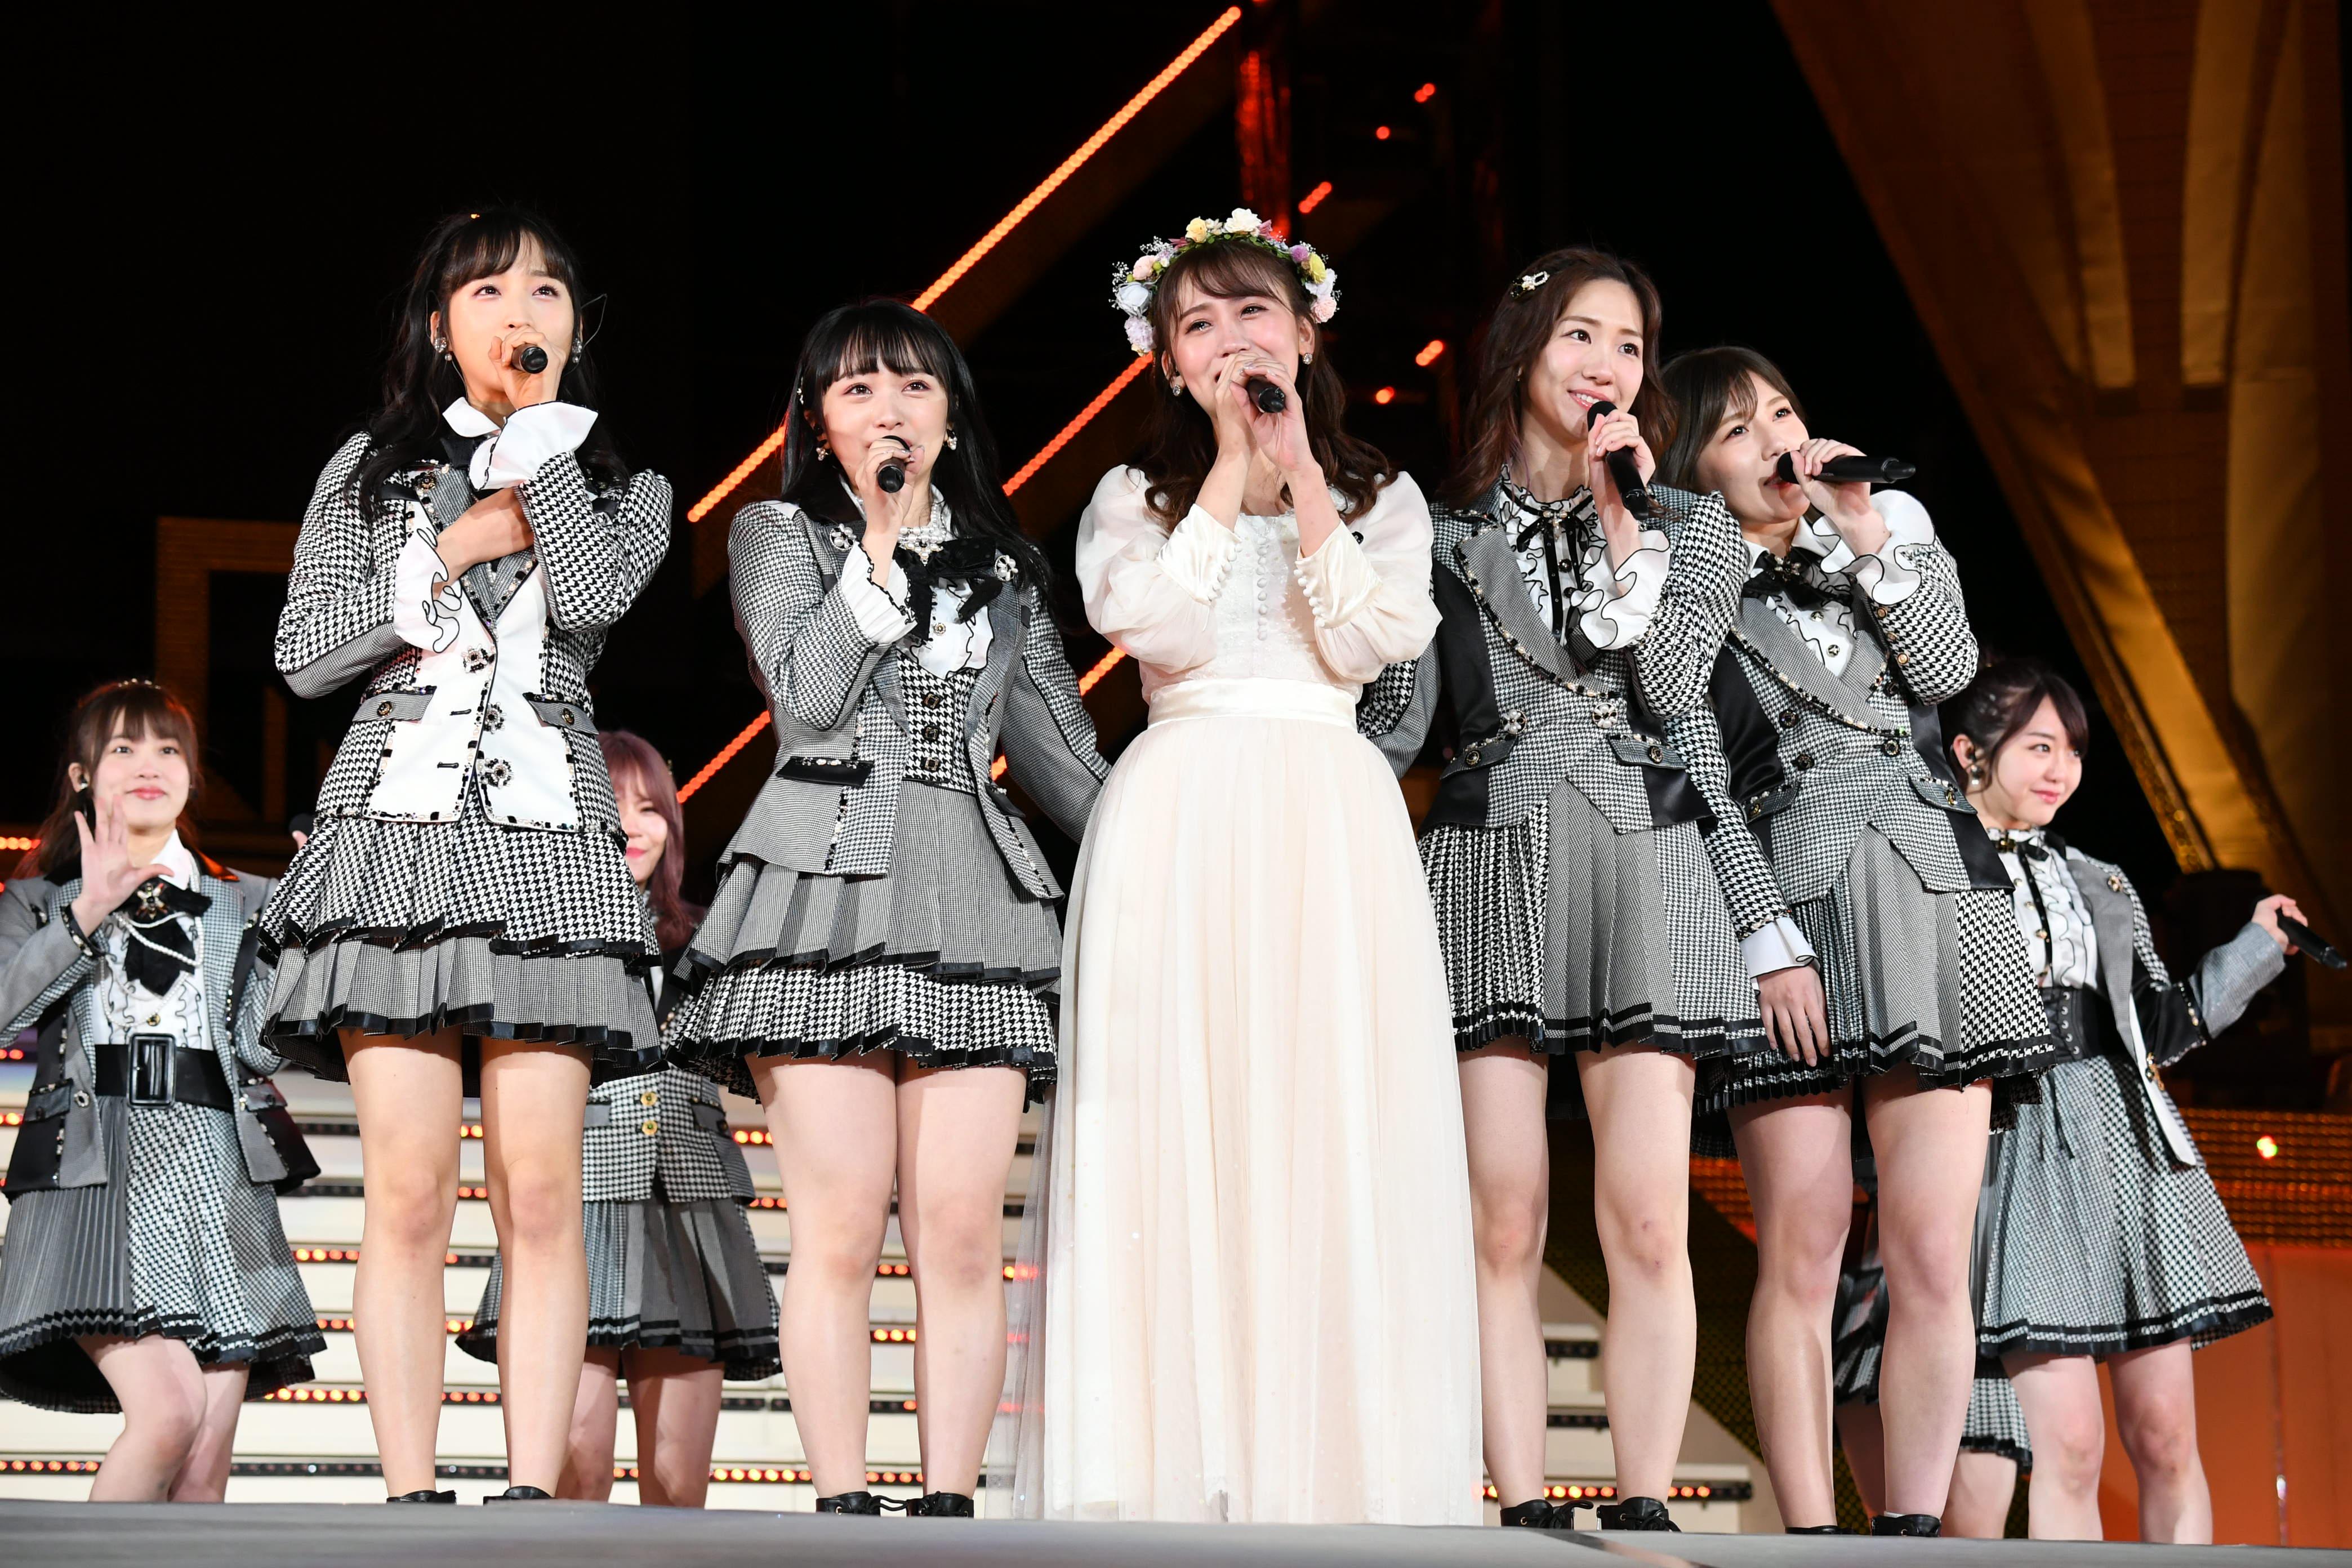 AKB48小嶋真子「笑顔で卒業」AKB48フェスのトリを飾る【写真19枚】の画像001